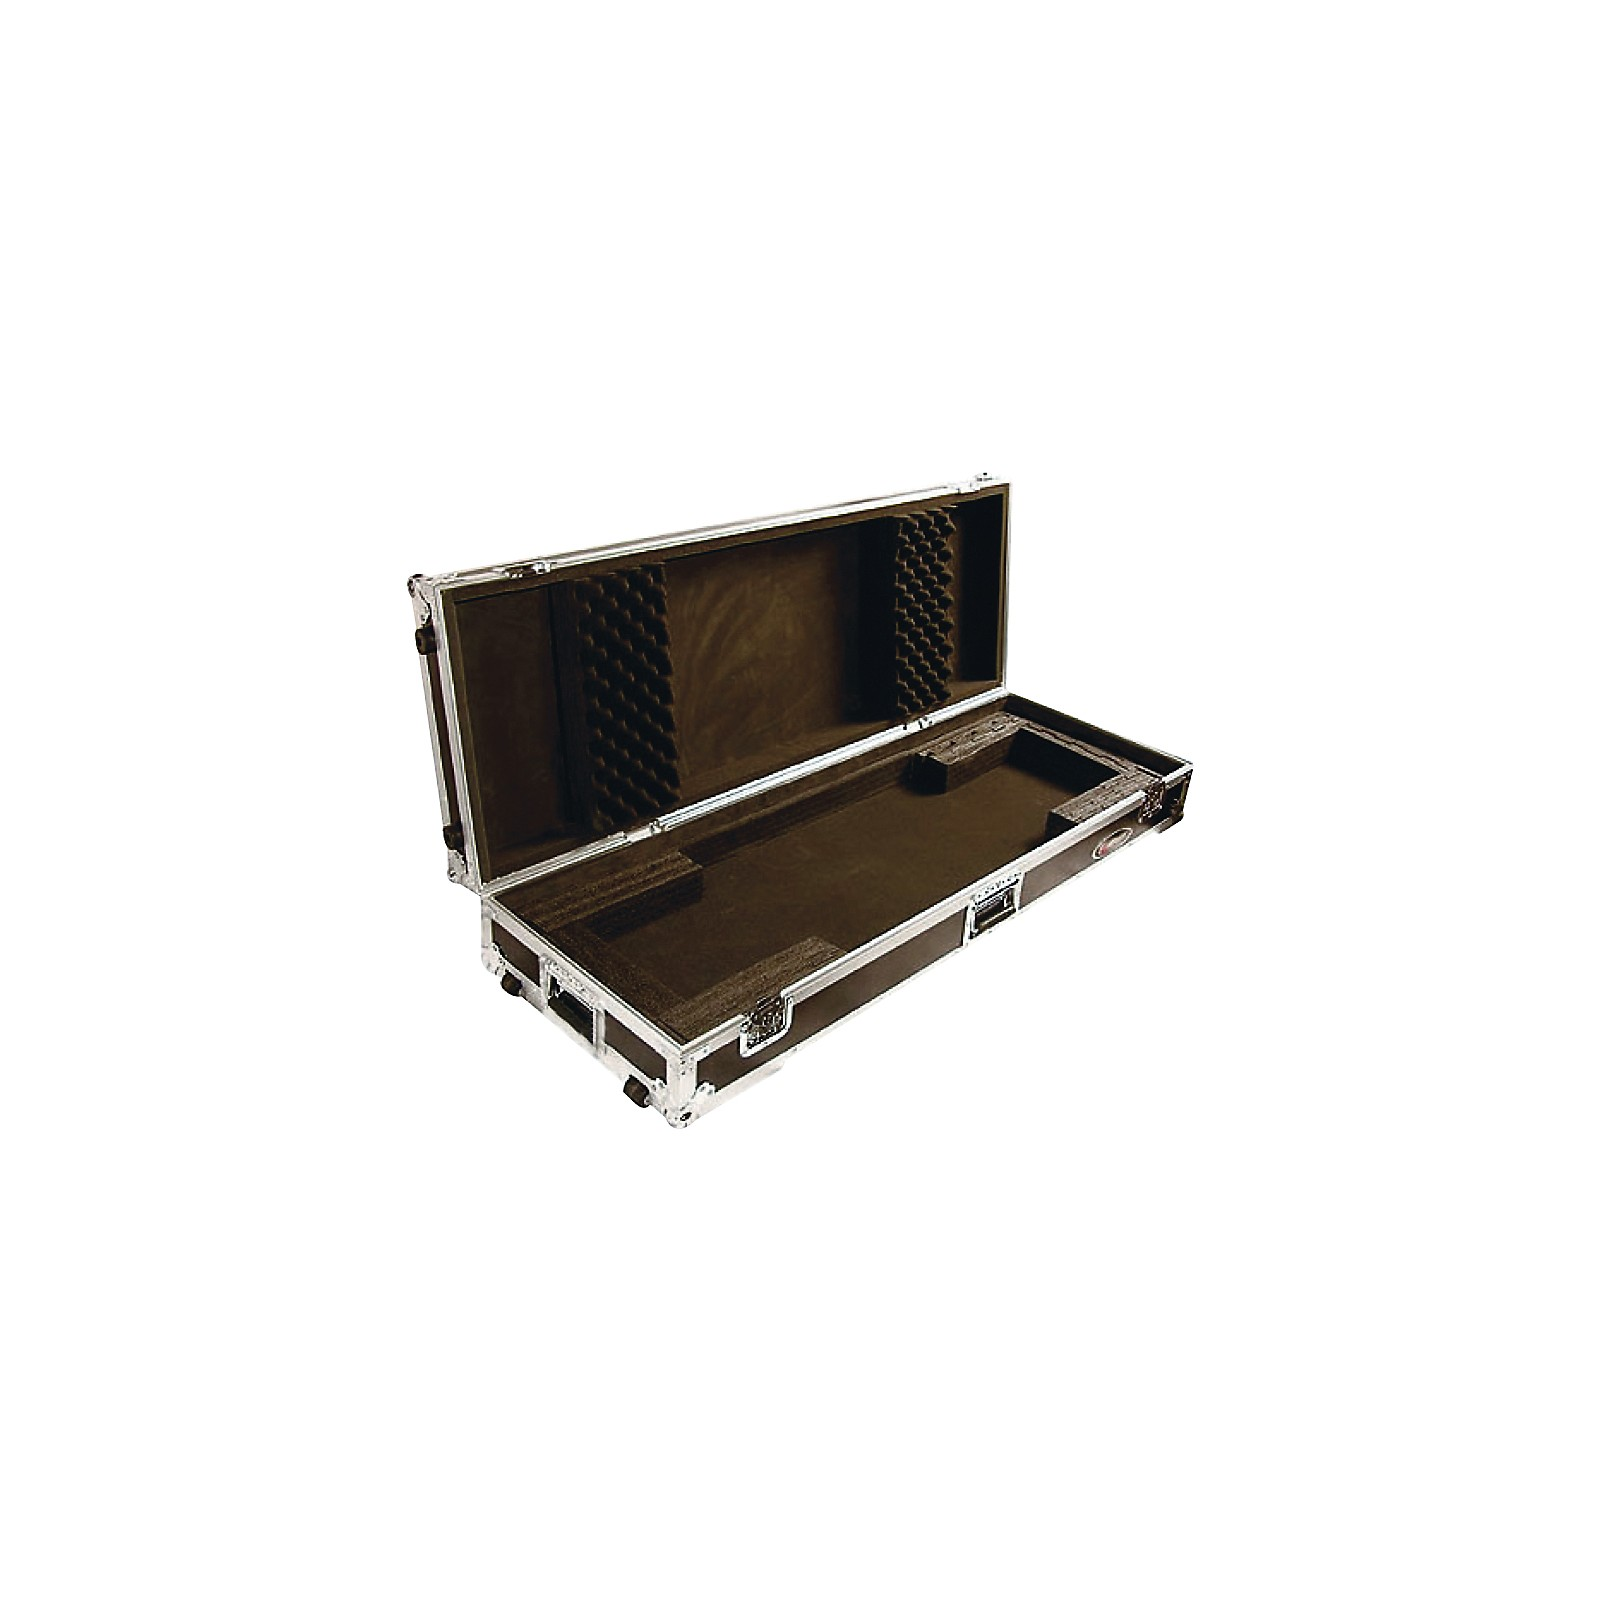 Odyssey Flight Zone: Keyboard case for 76 note keyboards with wheels